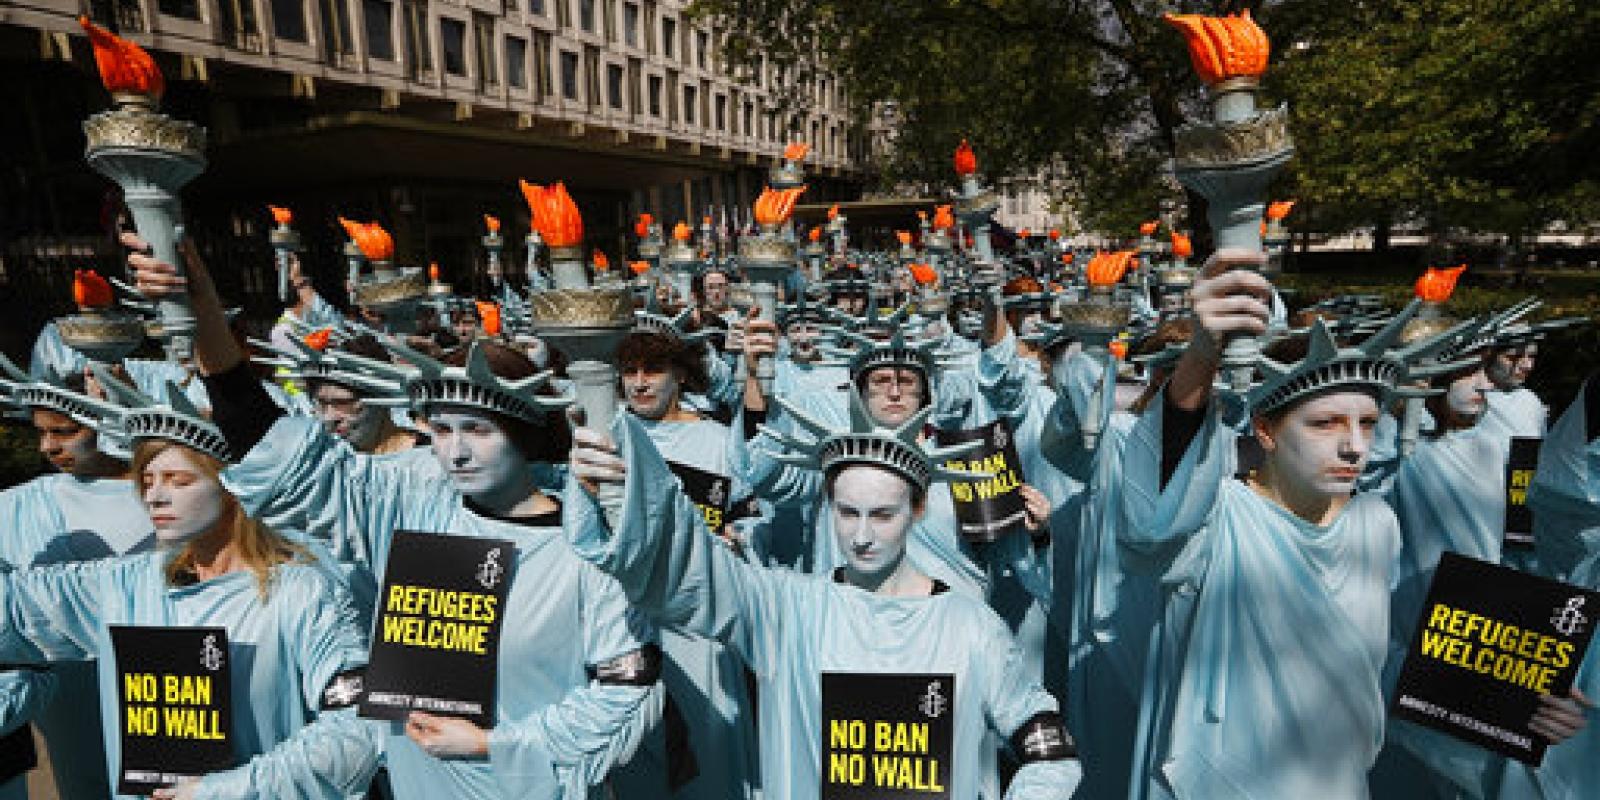 britain-trump-protestgonz-3.jpg